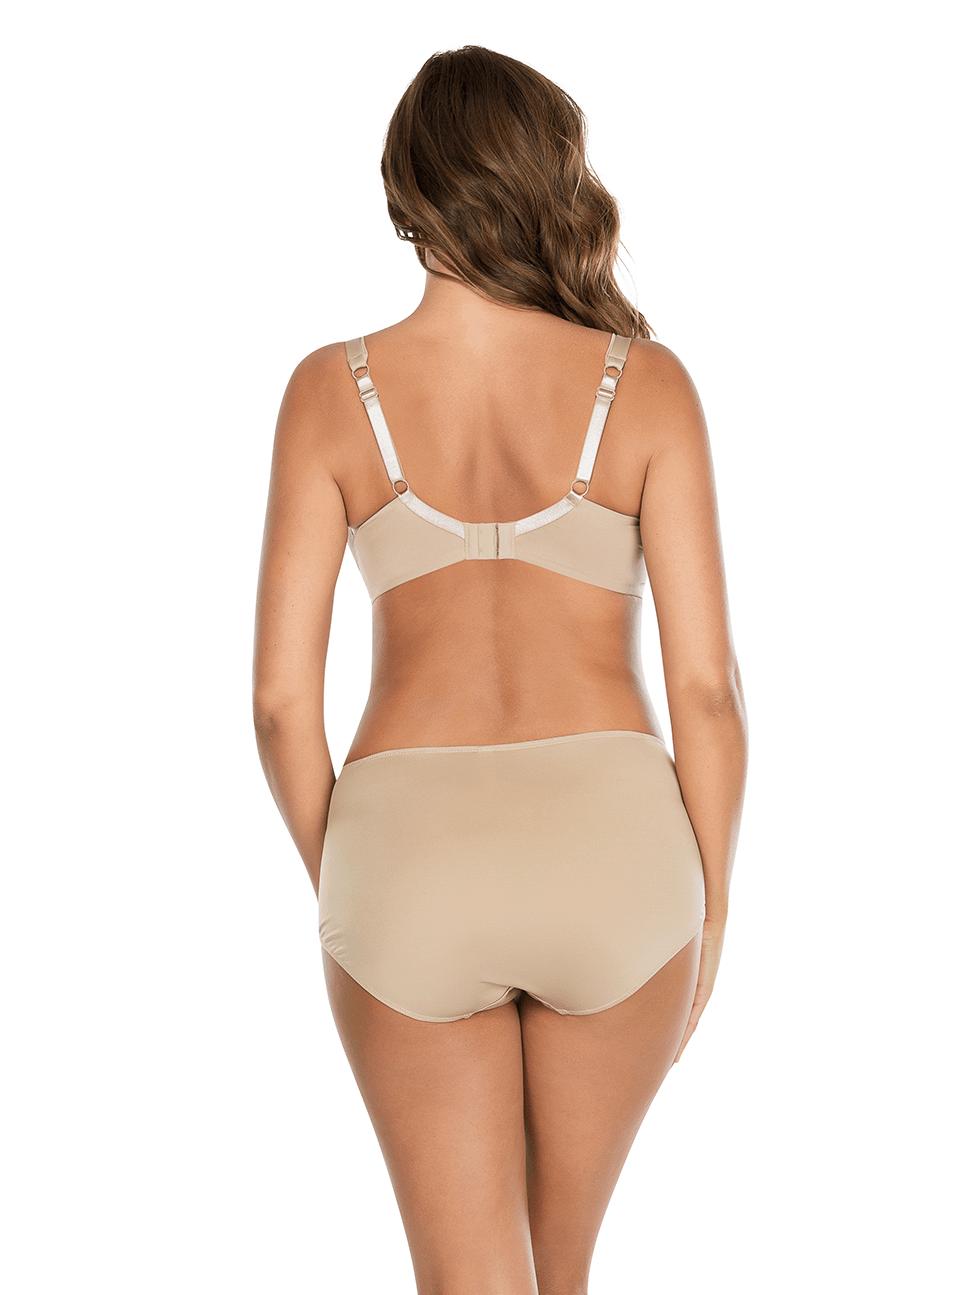 Jeanie TShirtBra4812 HighCutBrief4803 Back - Jeanie T-Shirt Bra - European Nude - 4812